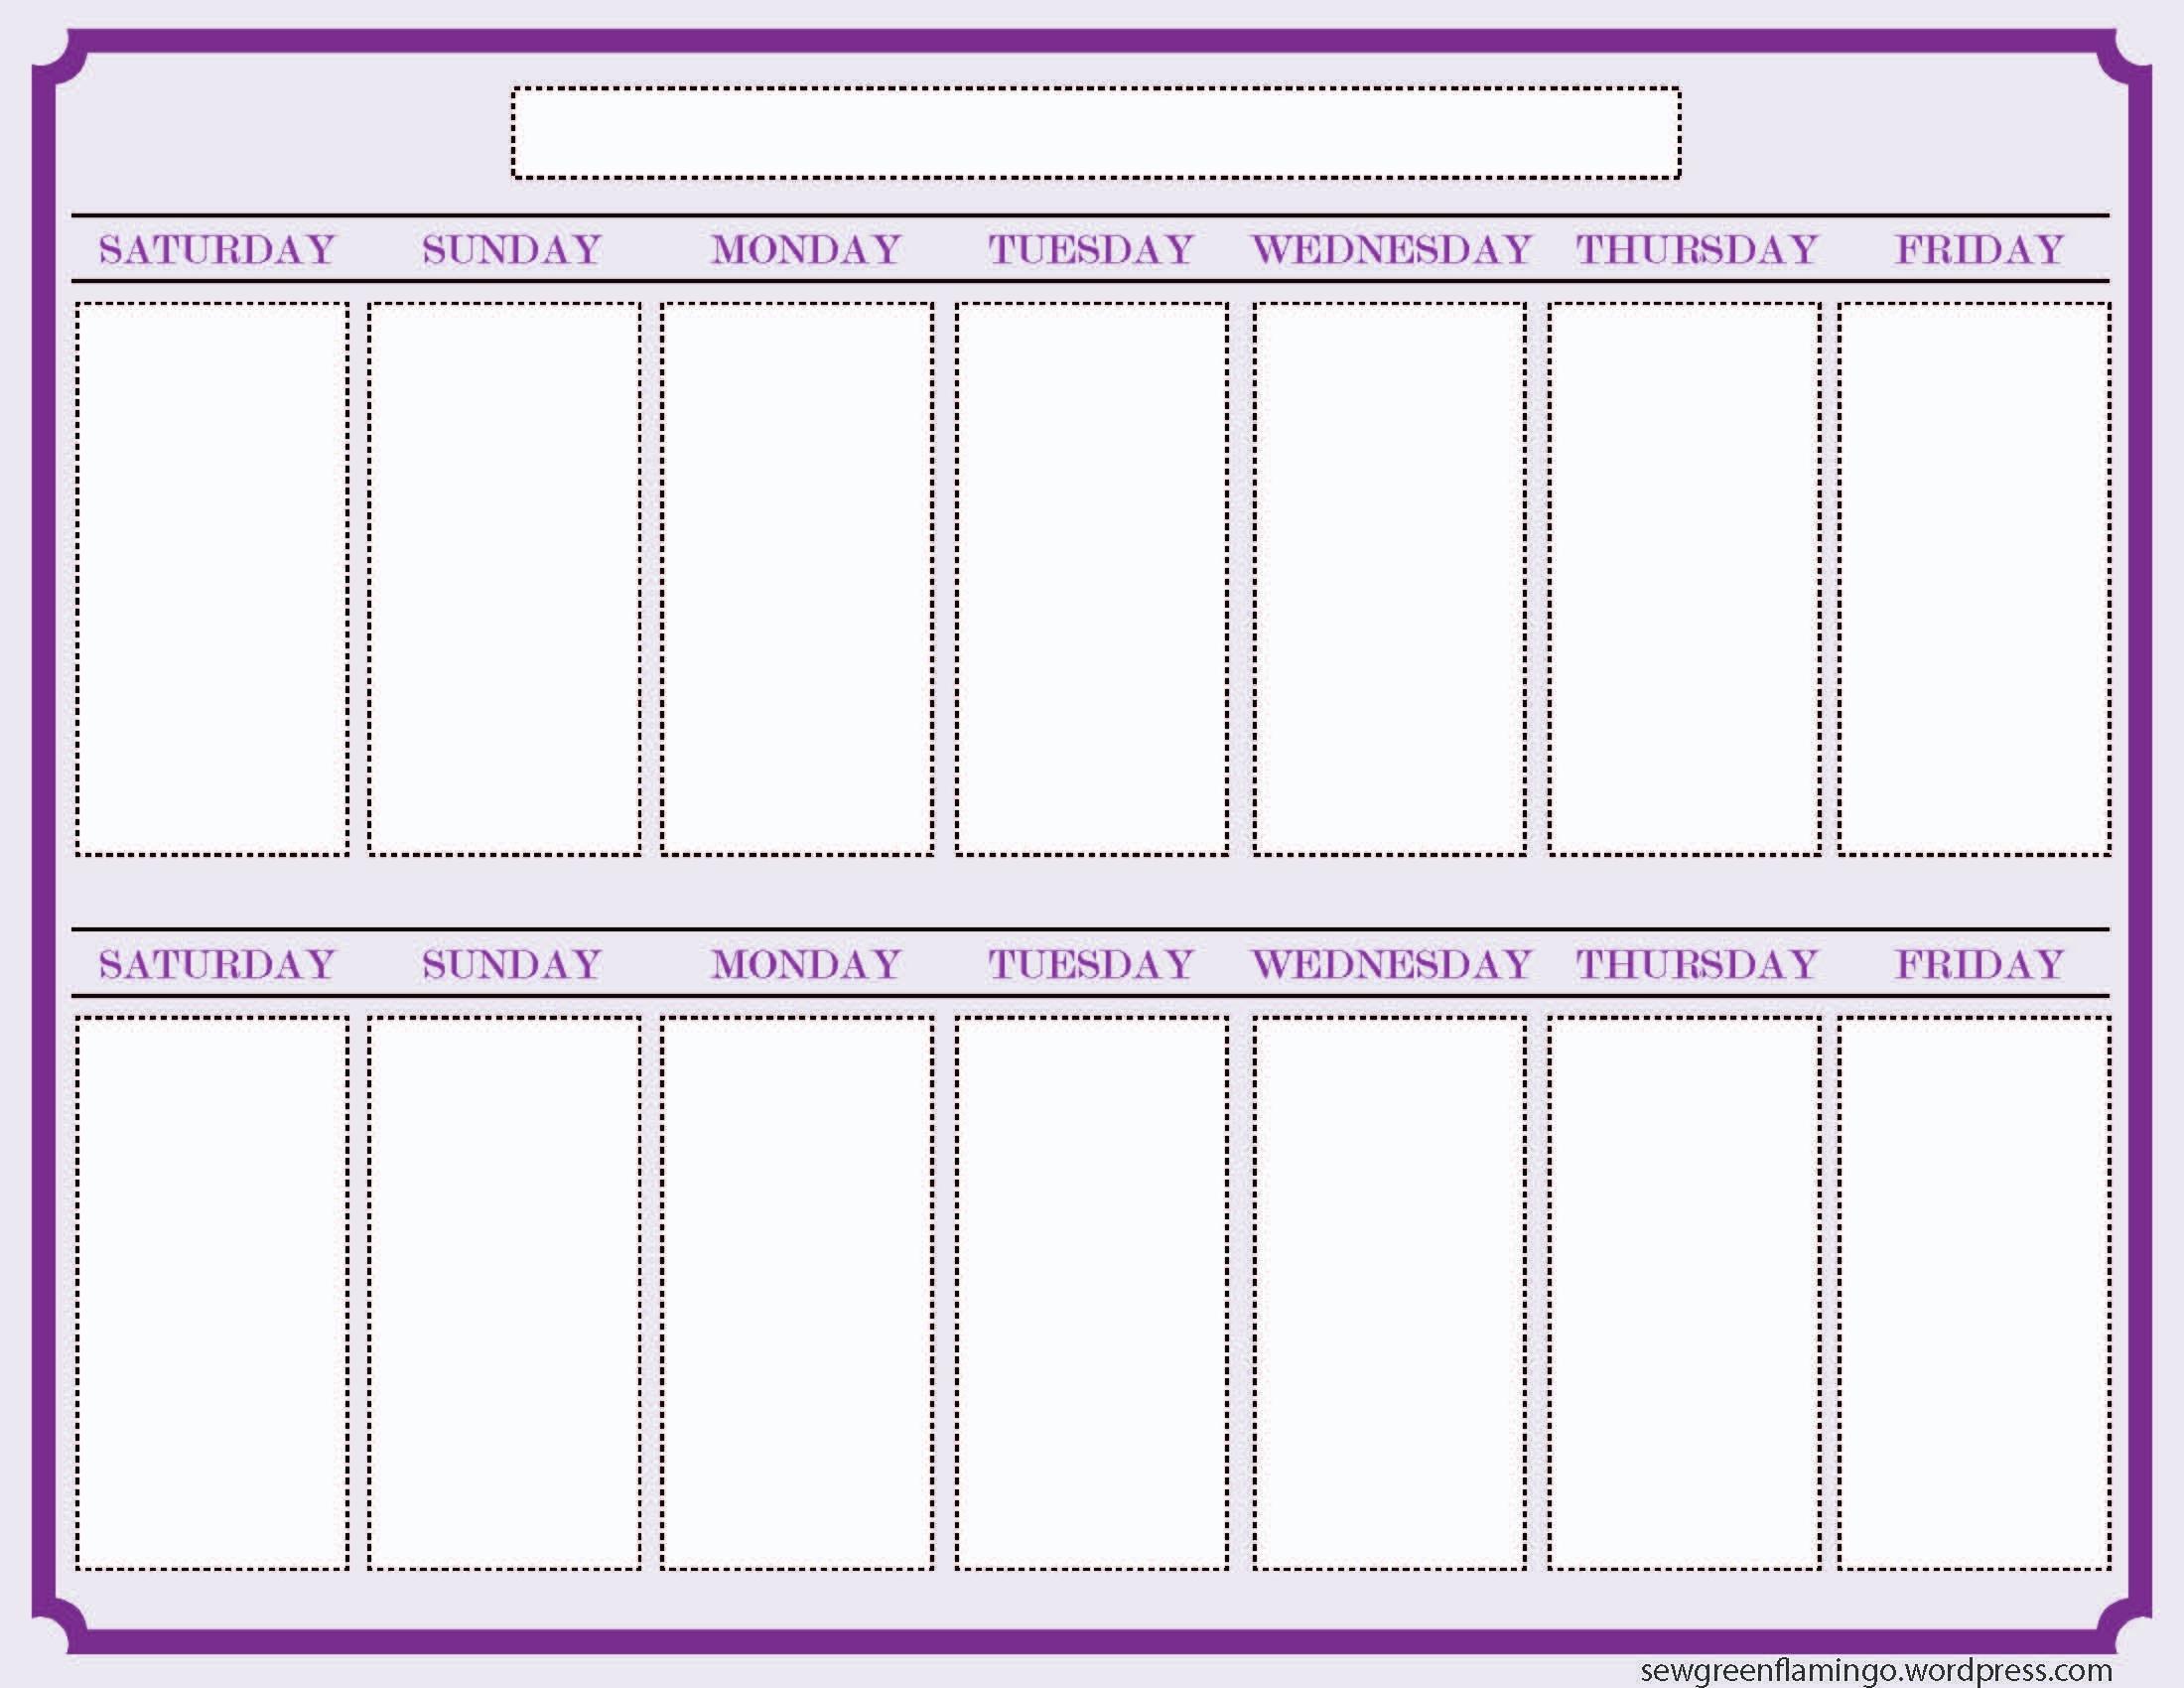 free 2 week blank printable calendar calendar 2018 design Free 2 Week Blank Printable Calendar erdferdf